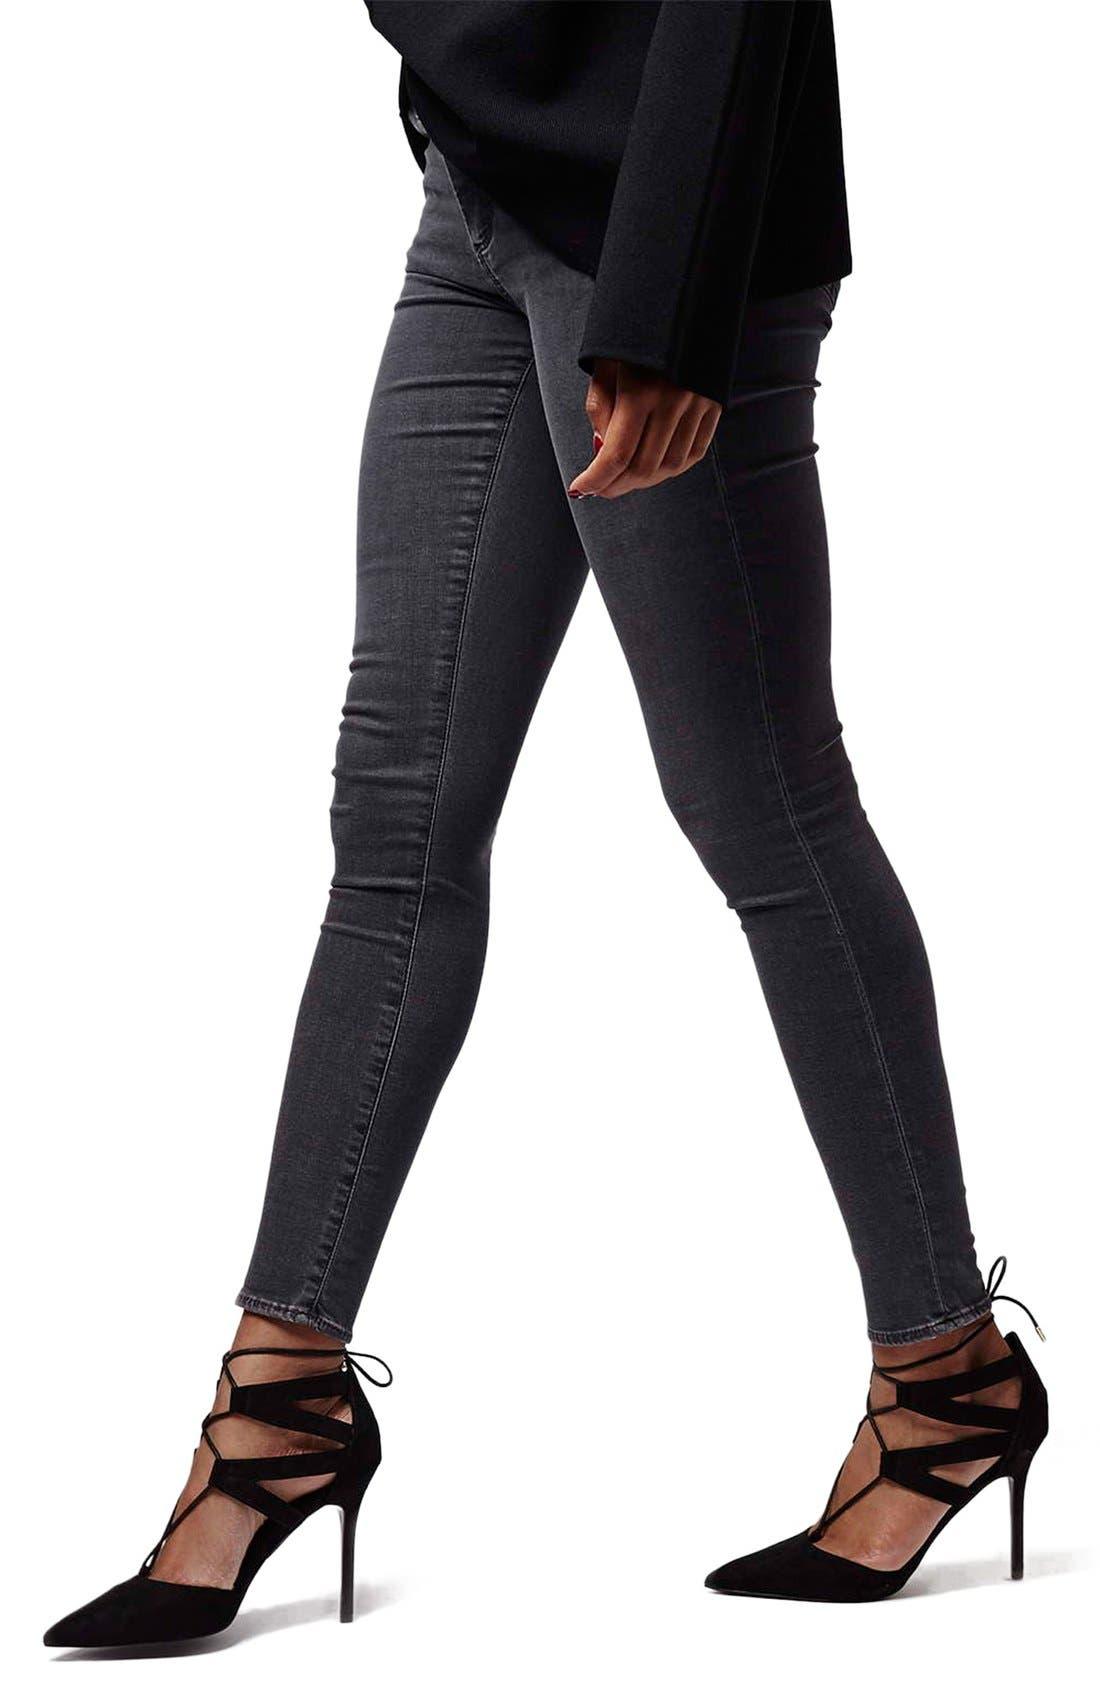 TOPSHOP, Moto 'Jamie' Skinny Jeans, Main thumbnail 1, color, 020